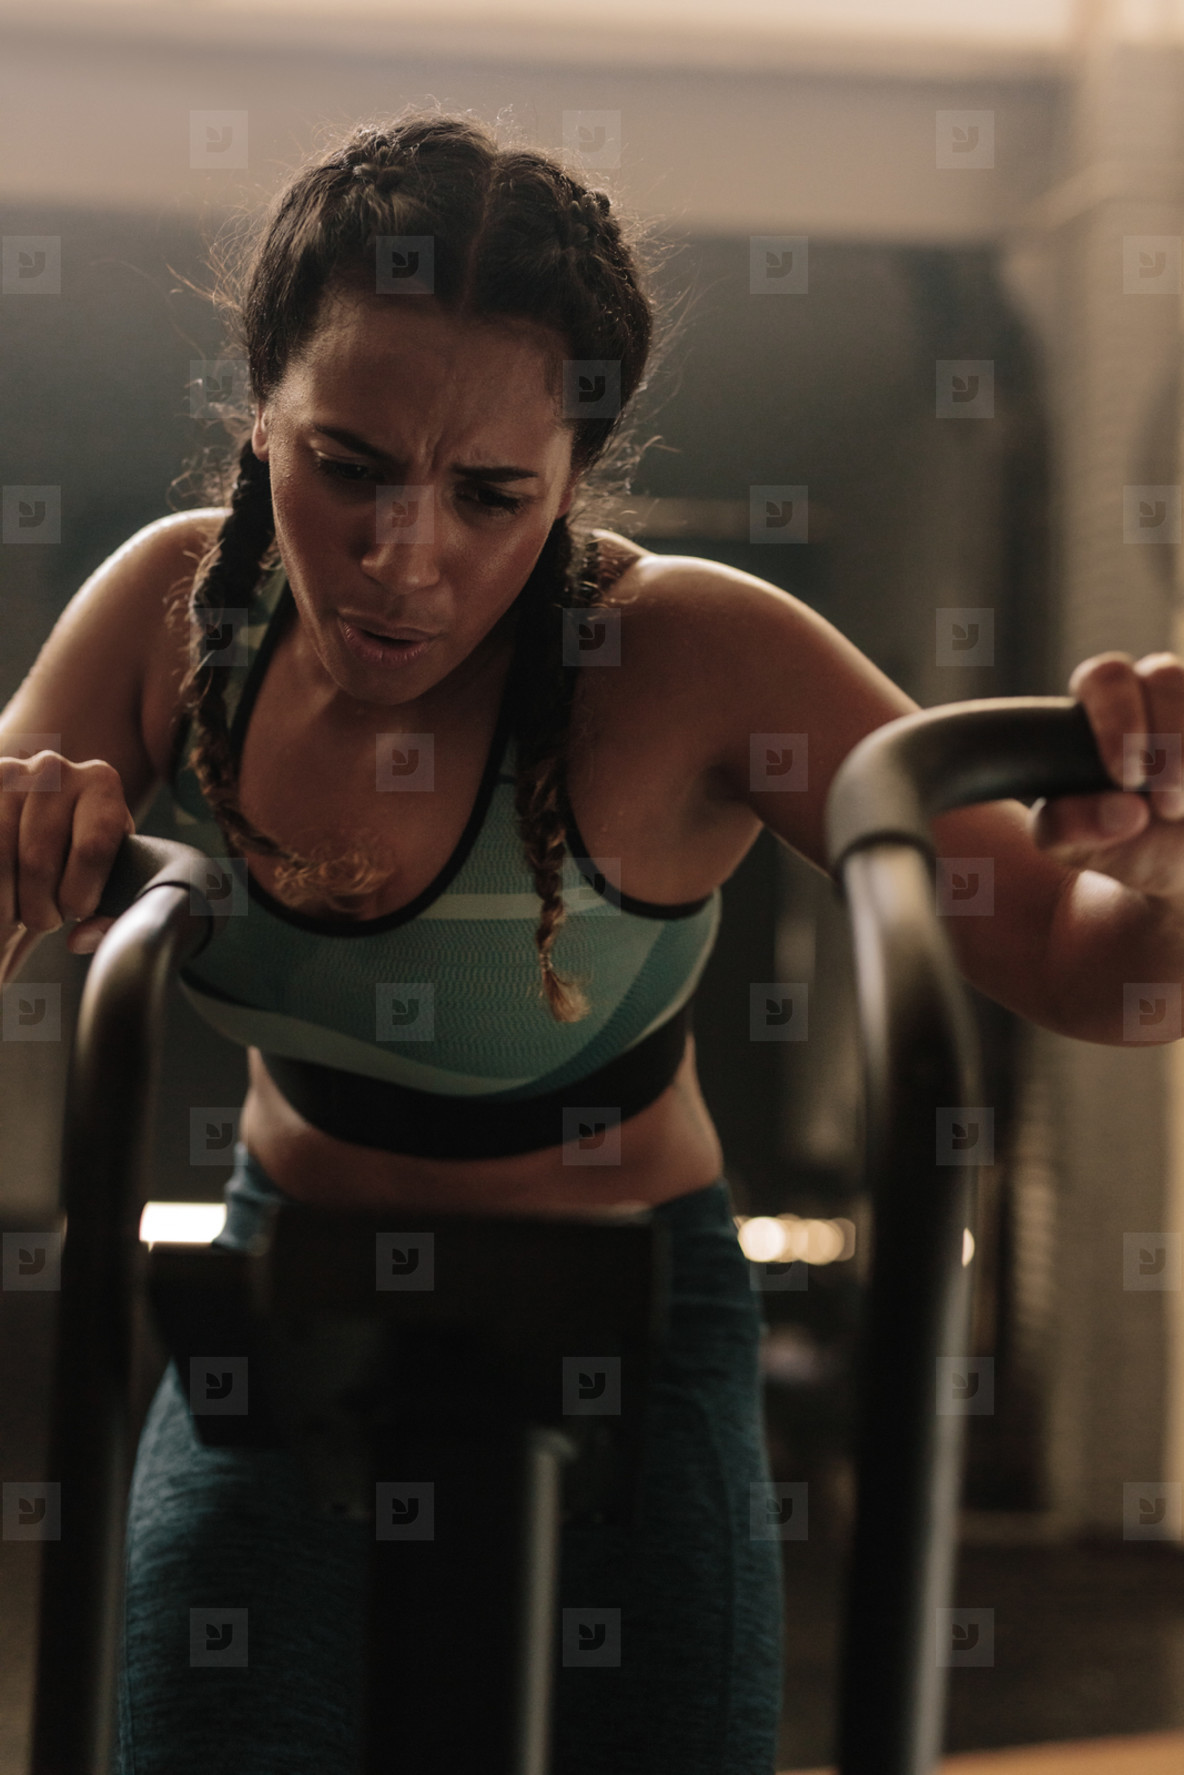 Female doing intense workout on exercise bike